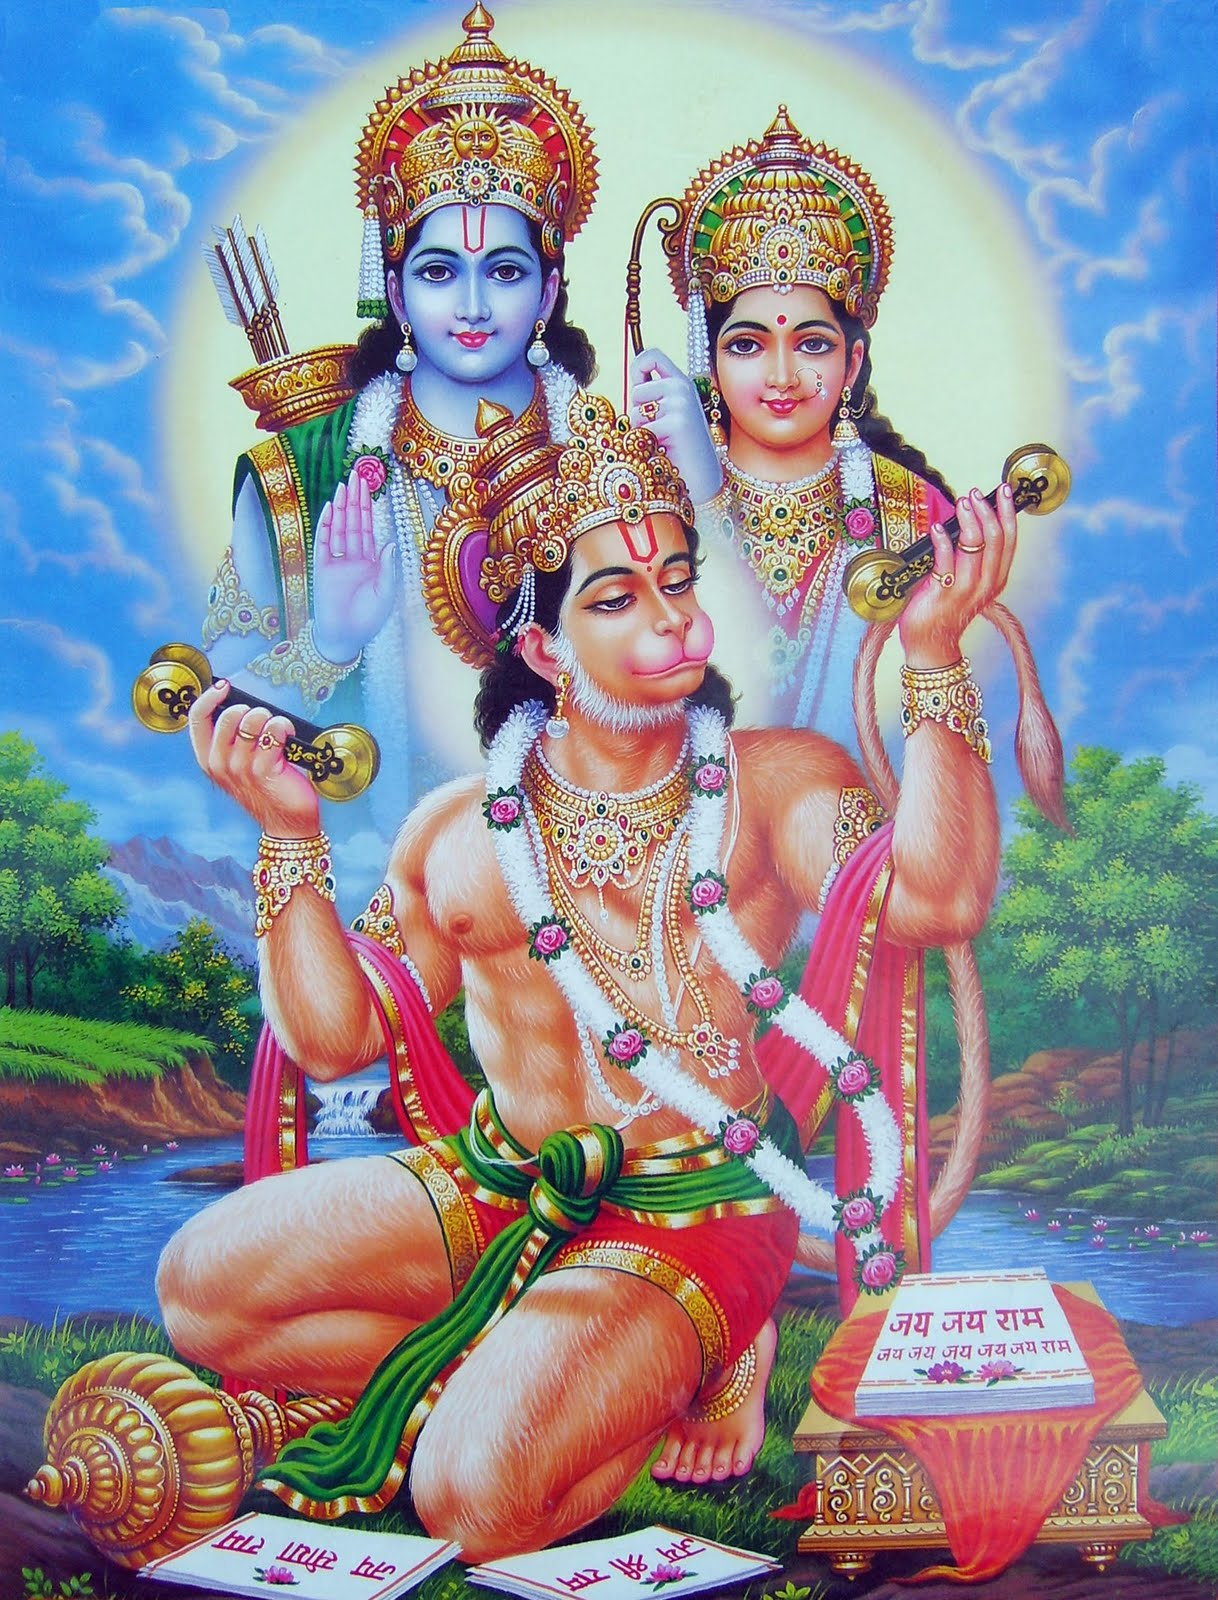 sita and rama relationship help